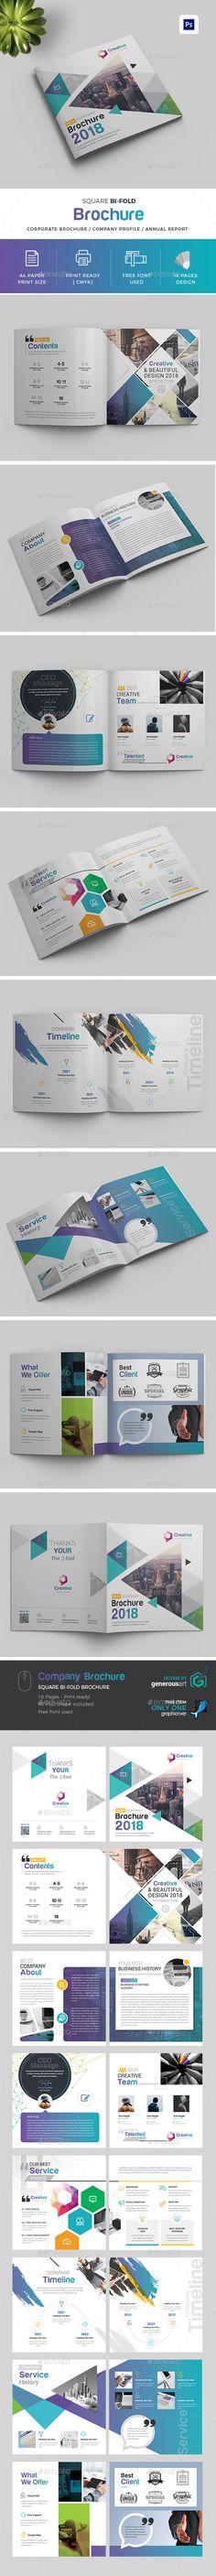 2018 Square Bi-Fold Brochure - #Print #Templates